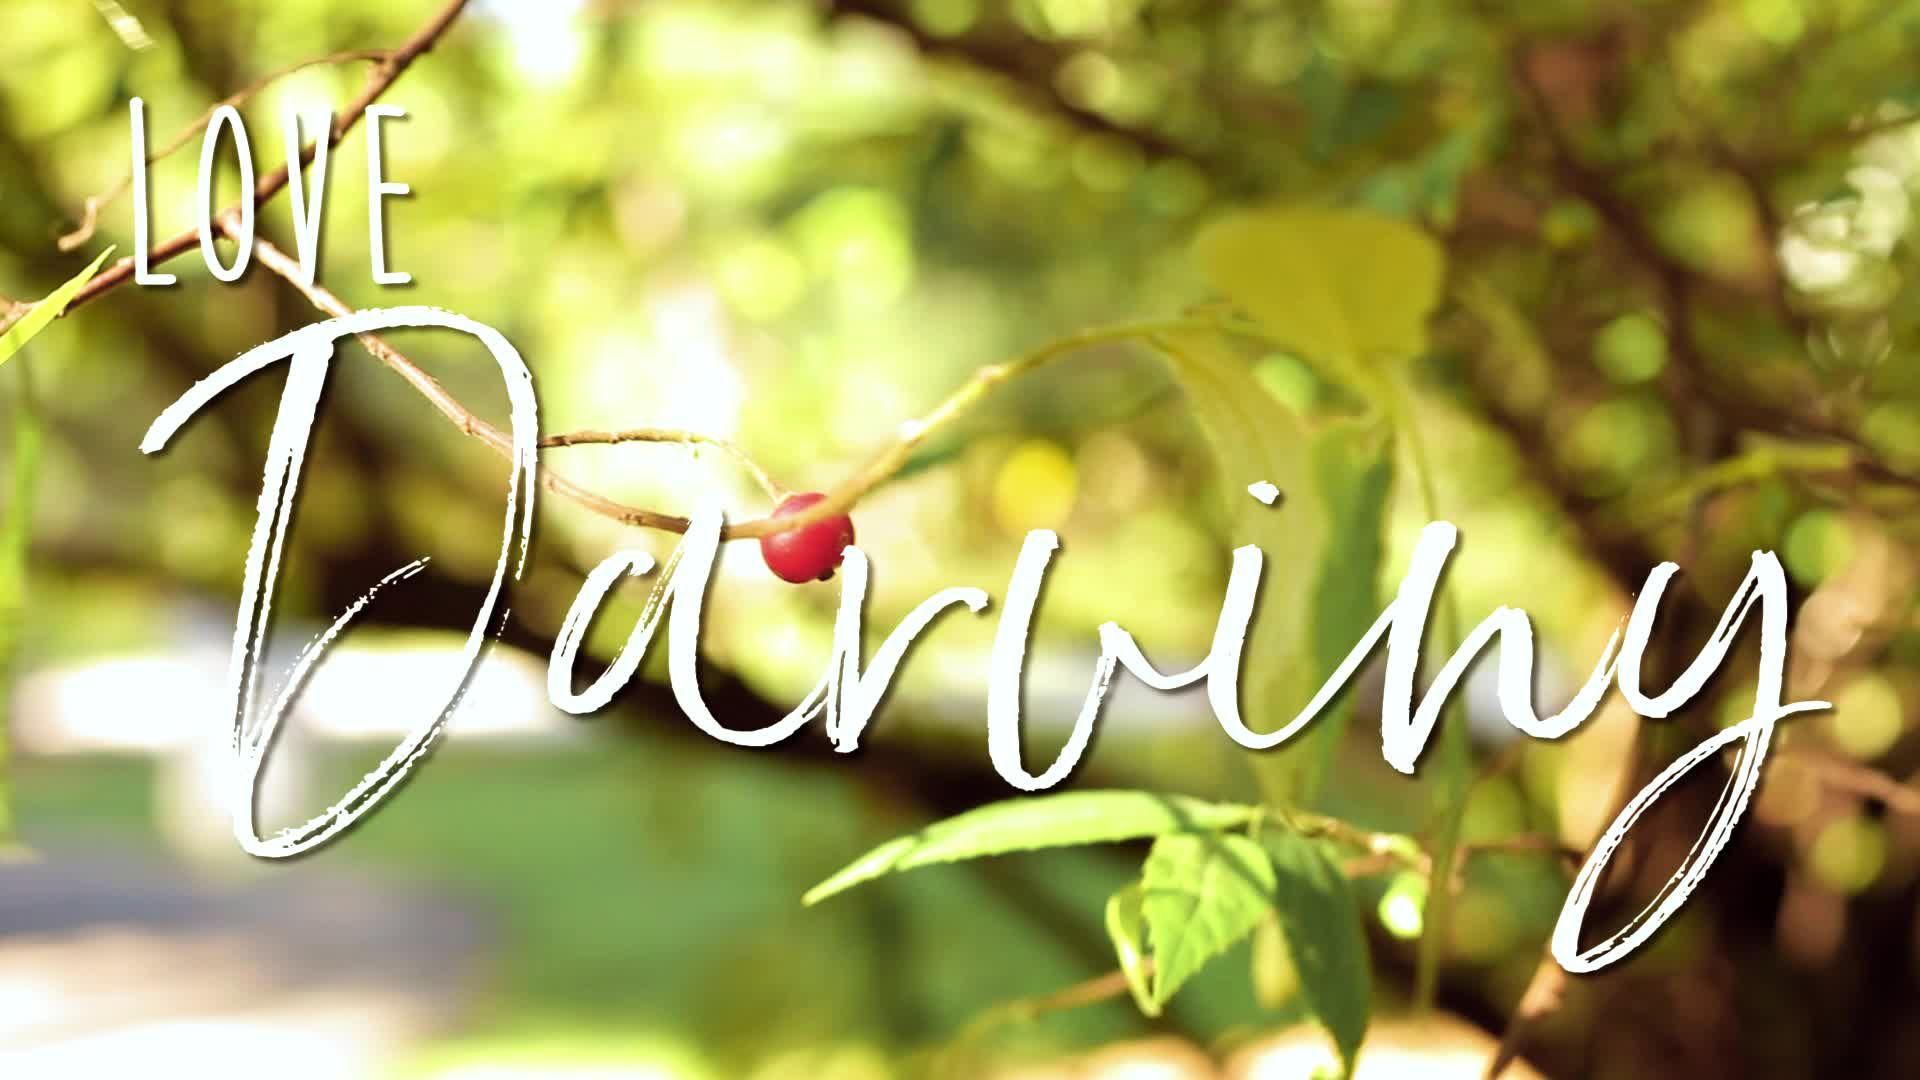 The Love, Darviny Show - Fruit & Spice Park